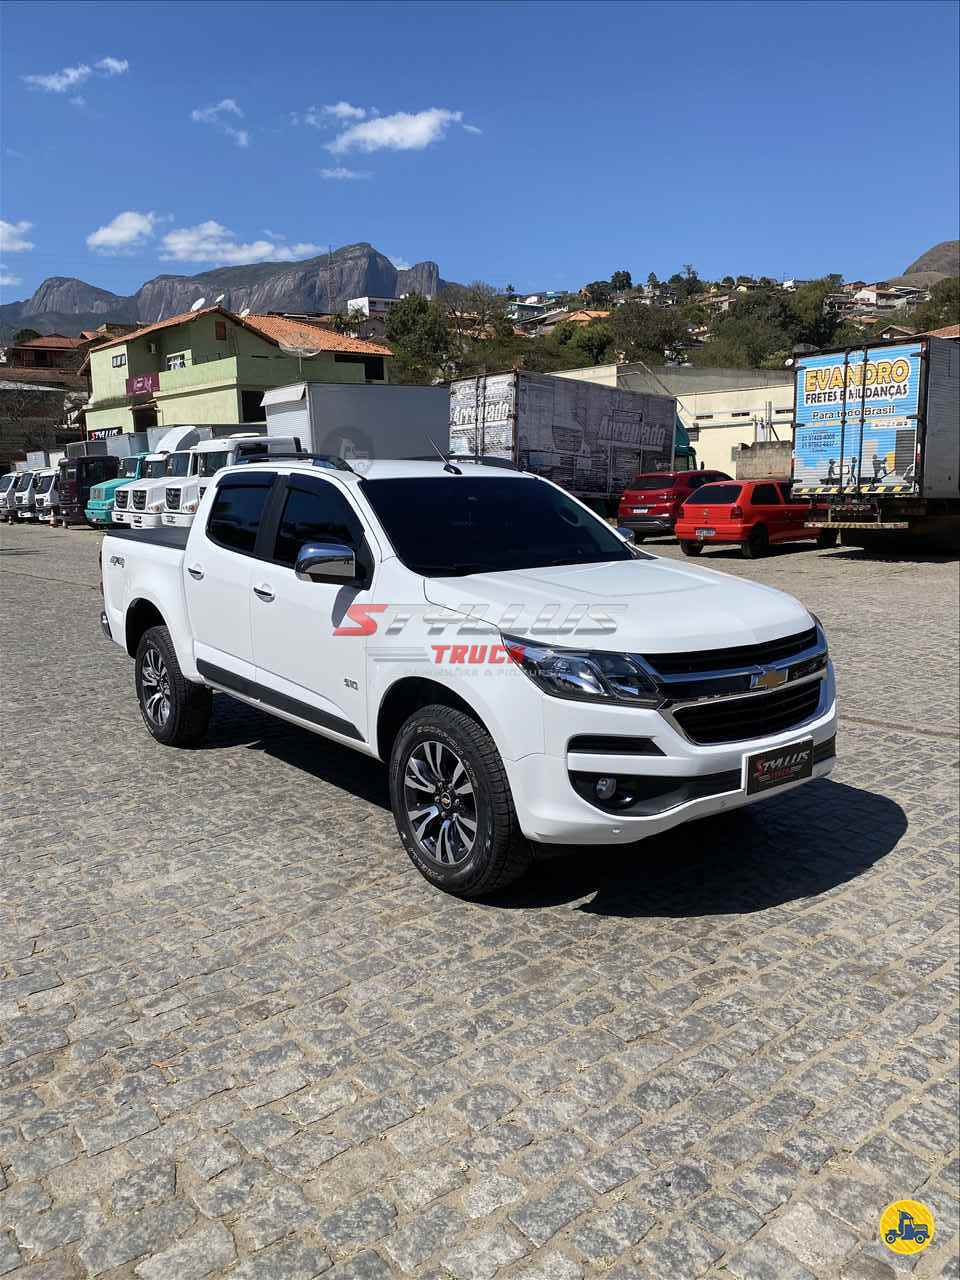 CARRO GM - Chevrolet S10 2.8 CD LTZ Styllus Truck TERESOPOLIS RIO DE JANEIRO RJ